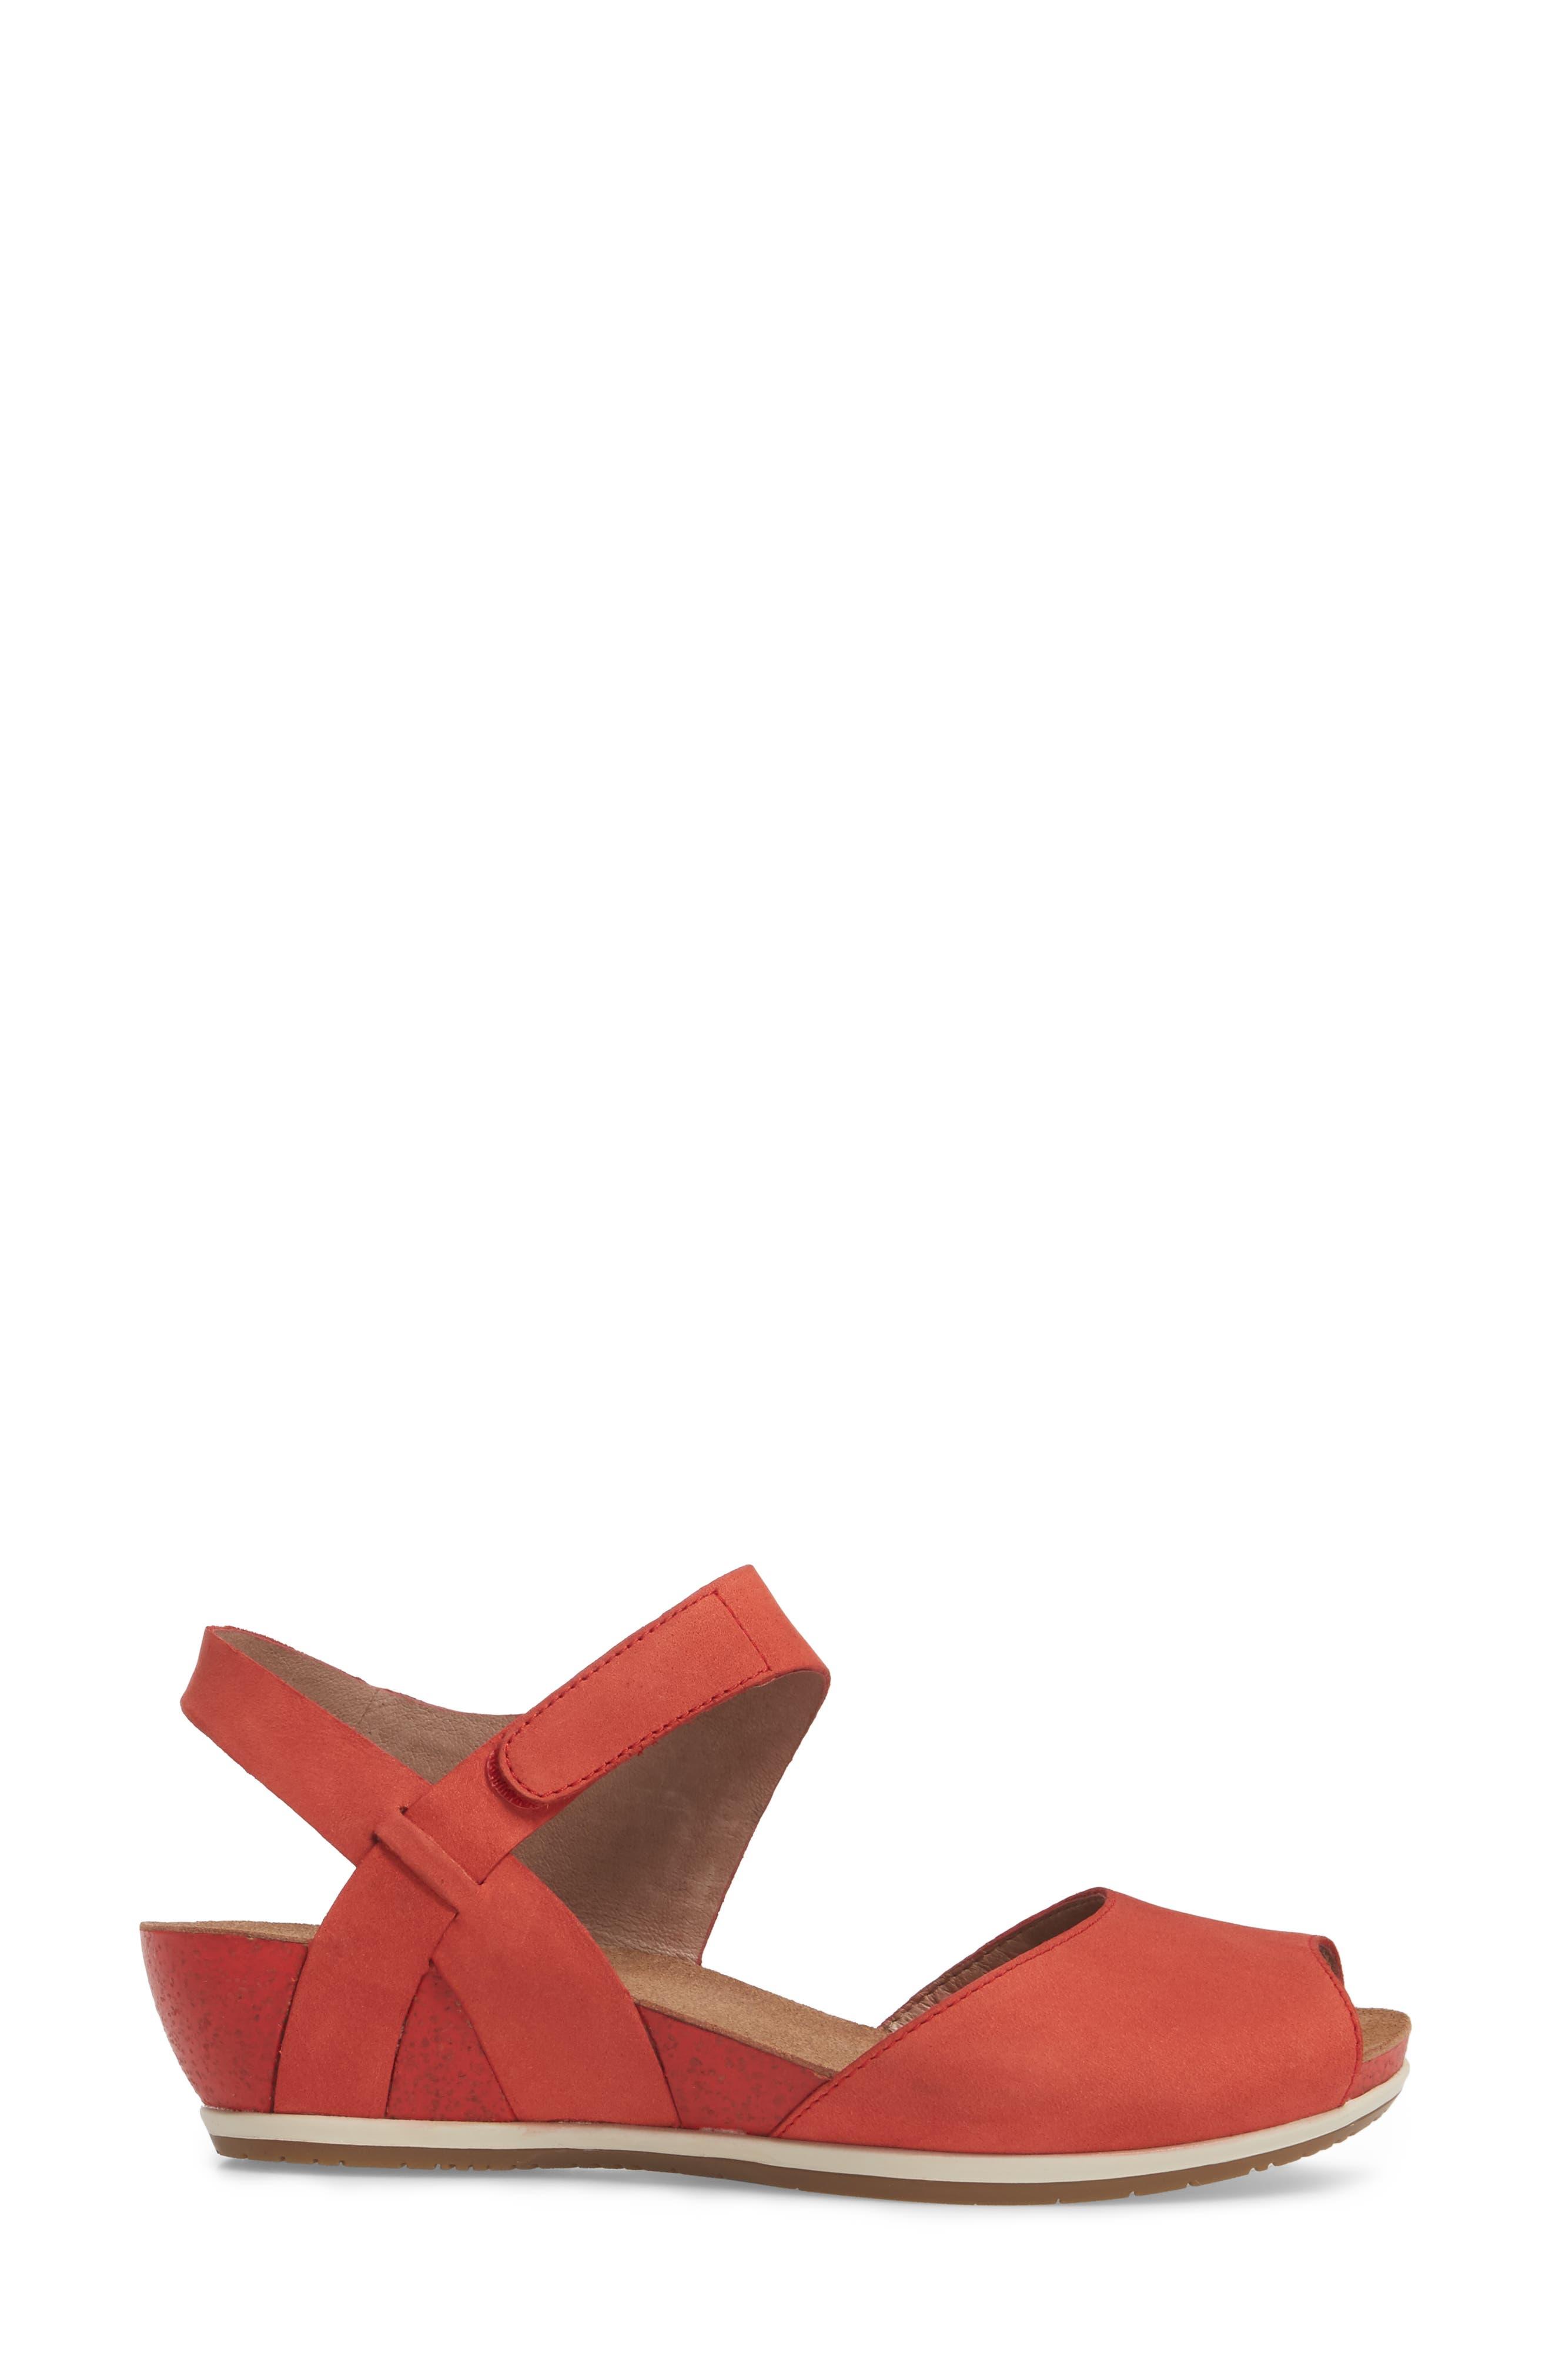 Vera Sandal,                             Alternate thumbnail 3, color,                             Tomato Milled Nubuck Leather